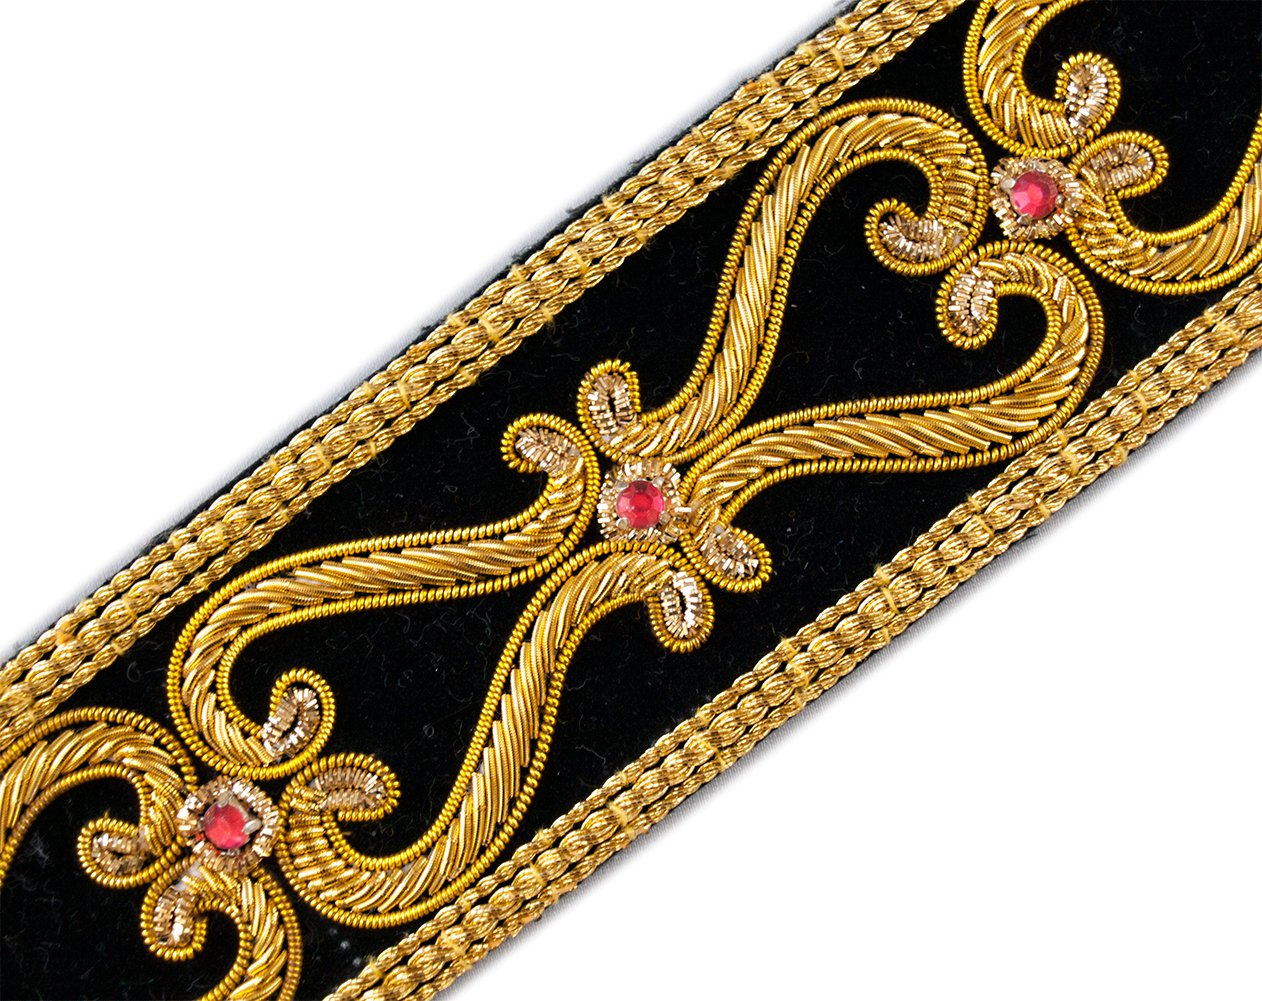 Our Finest Hand-Beaded Trim Renaissance Style Gold Bullion on Black Velvet 1.5'' Wide by Heritage Trim